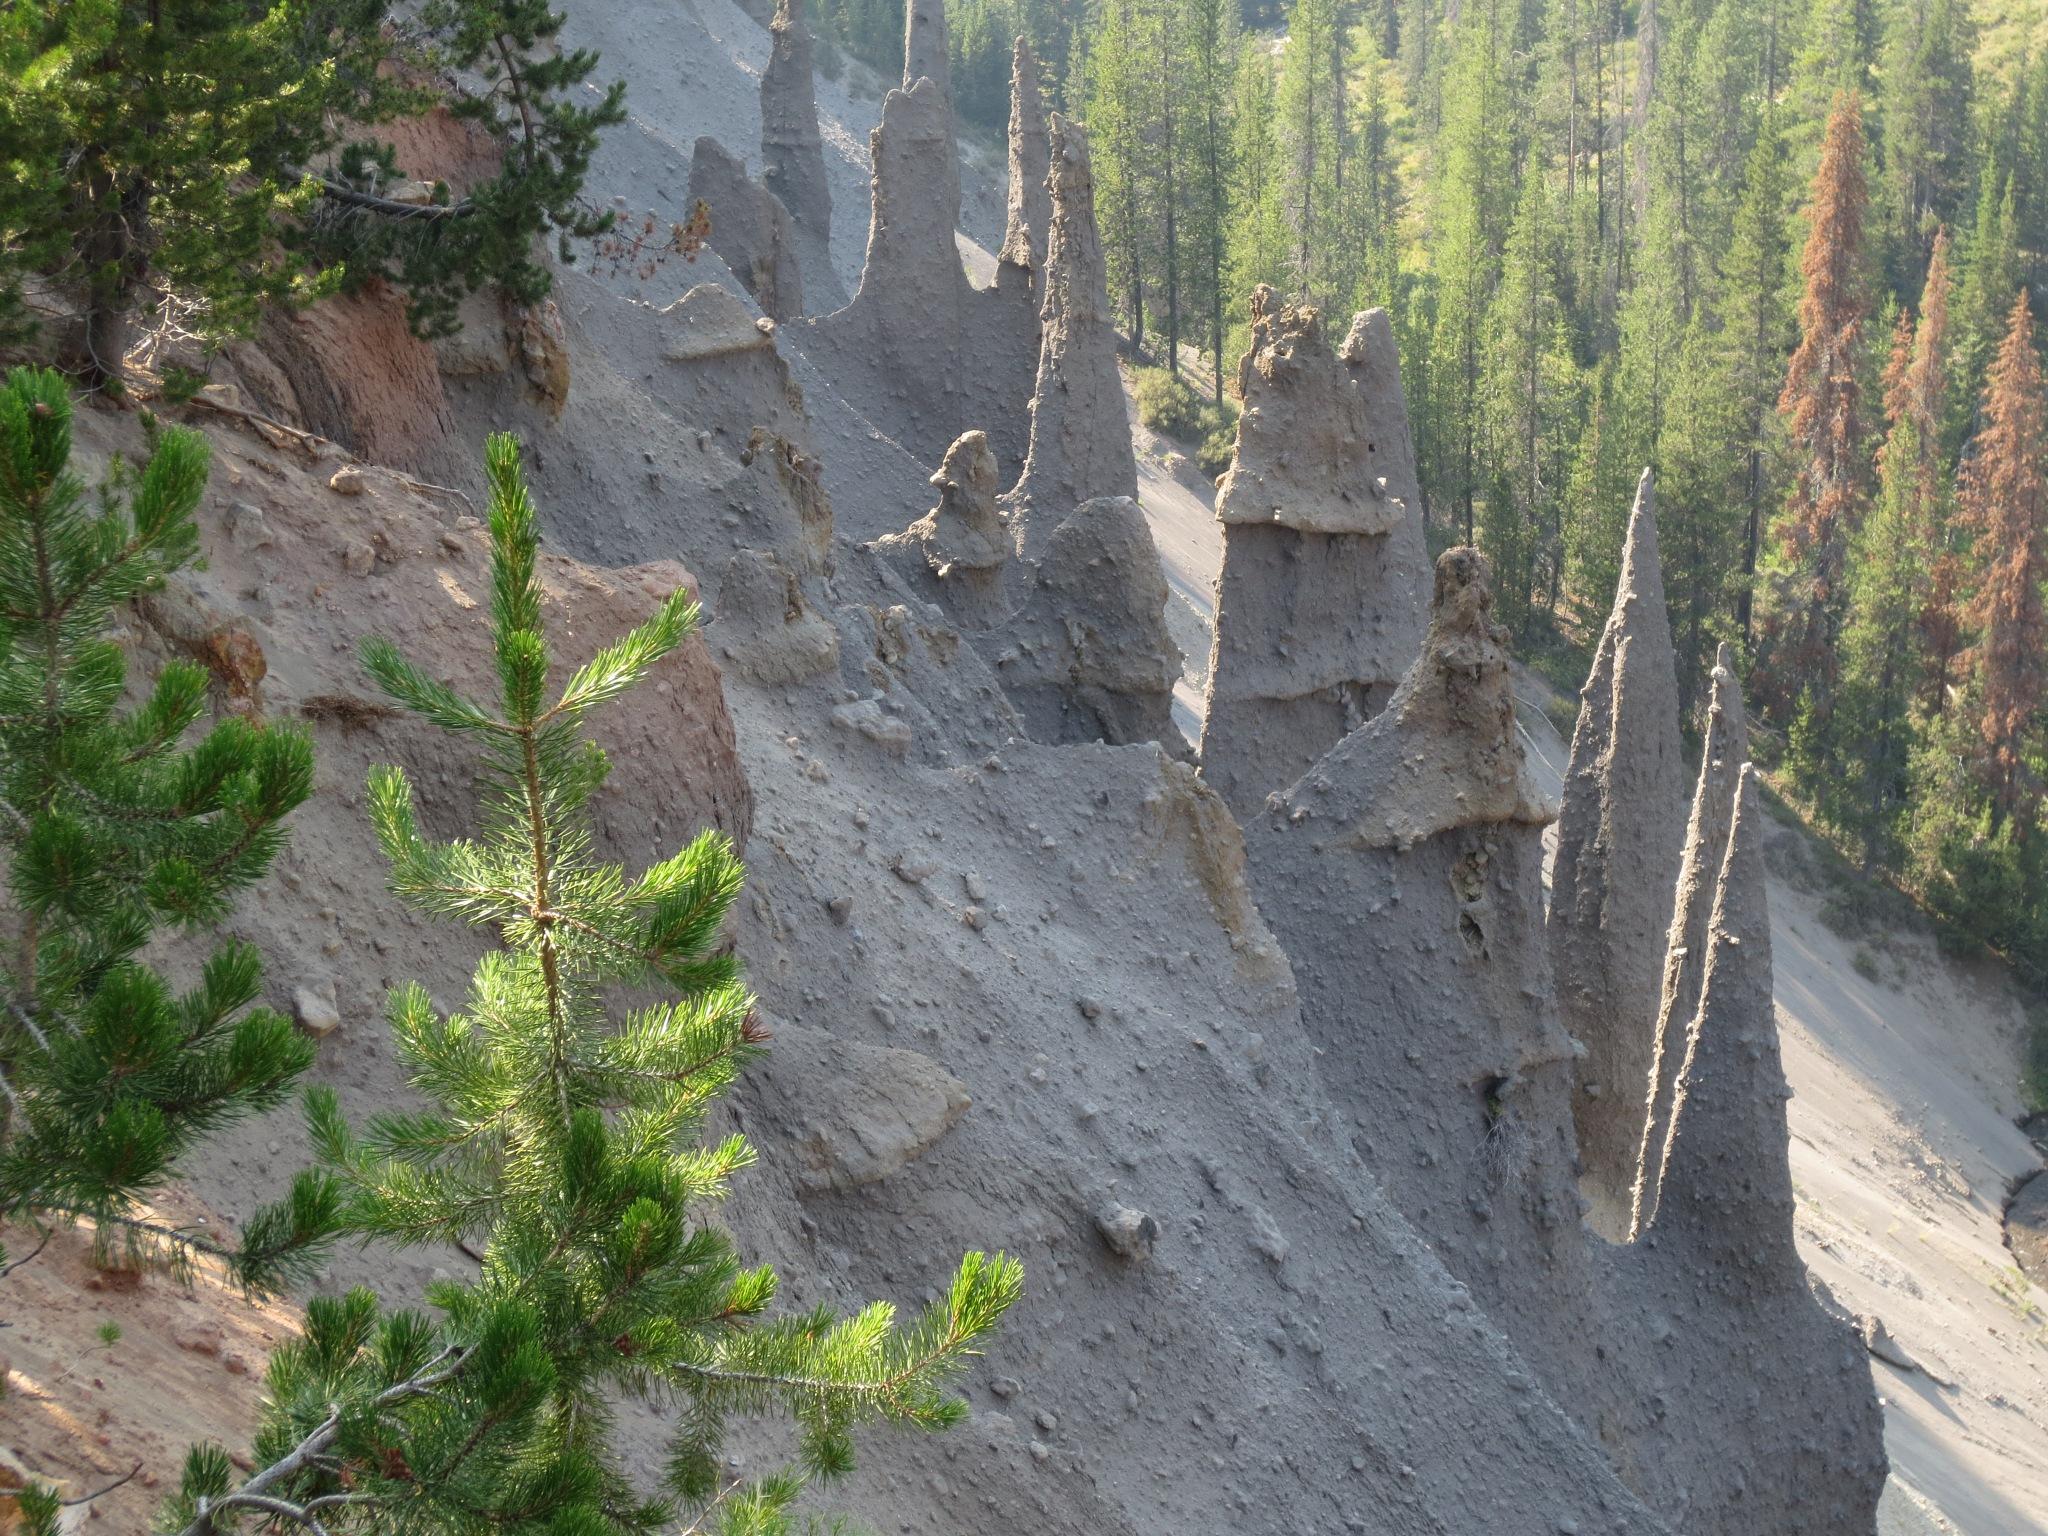 The Pinnacles overlook by Lani Ayala